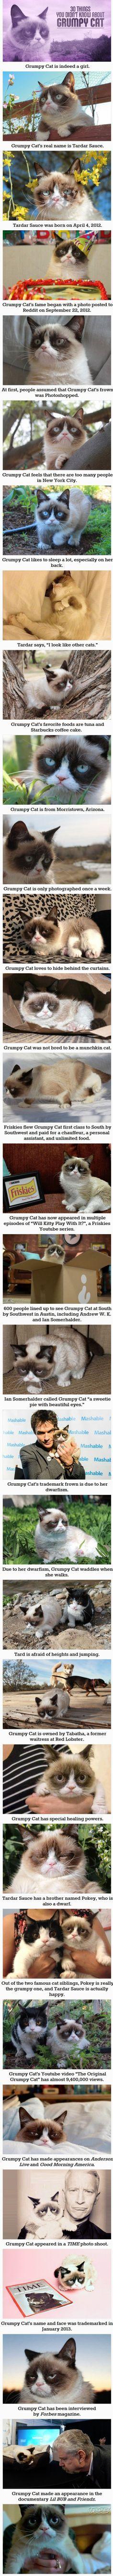 The life of Grumpy Cat